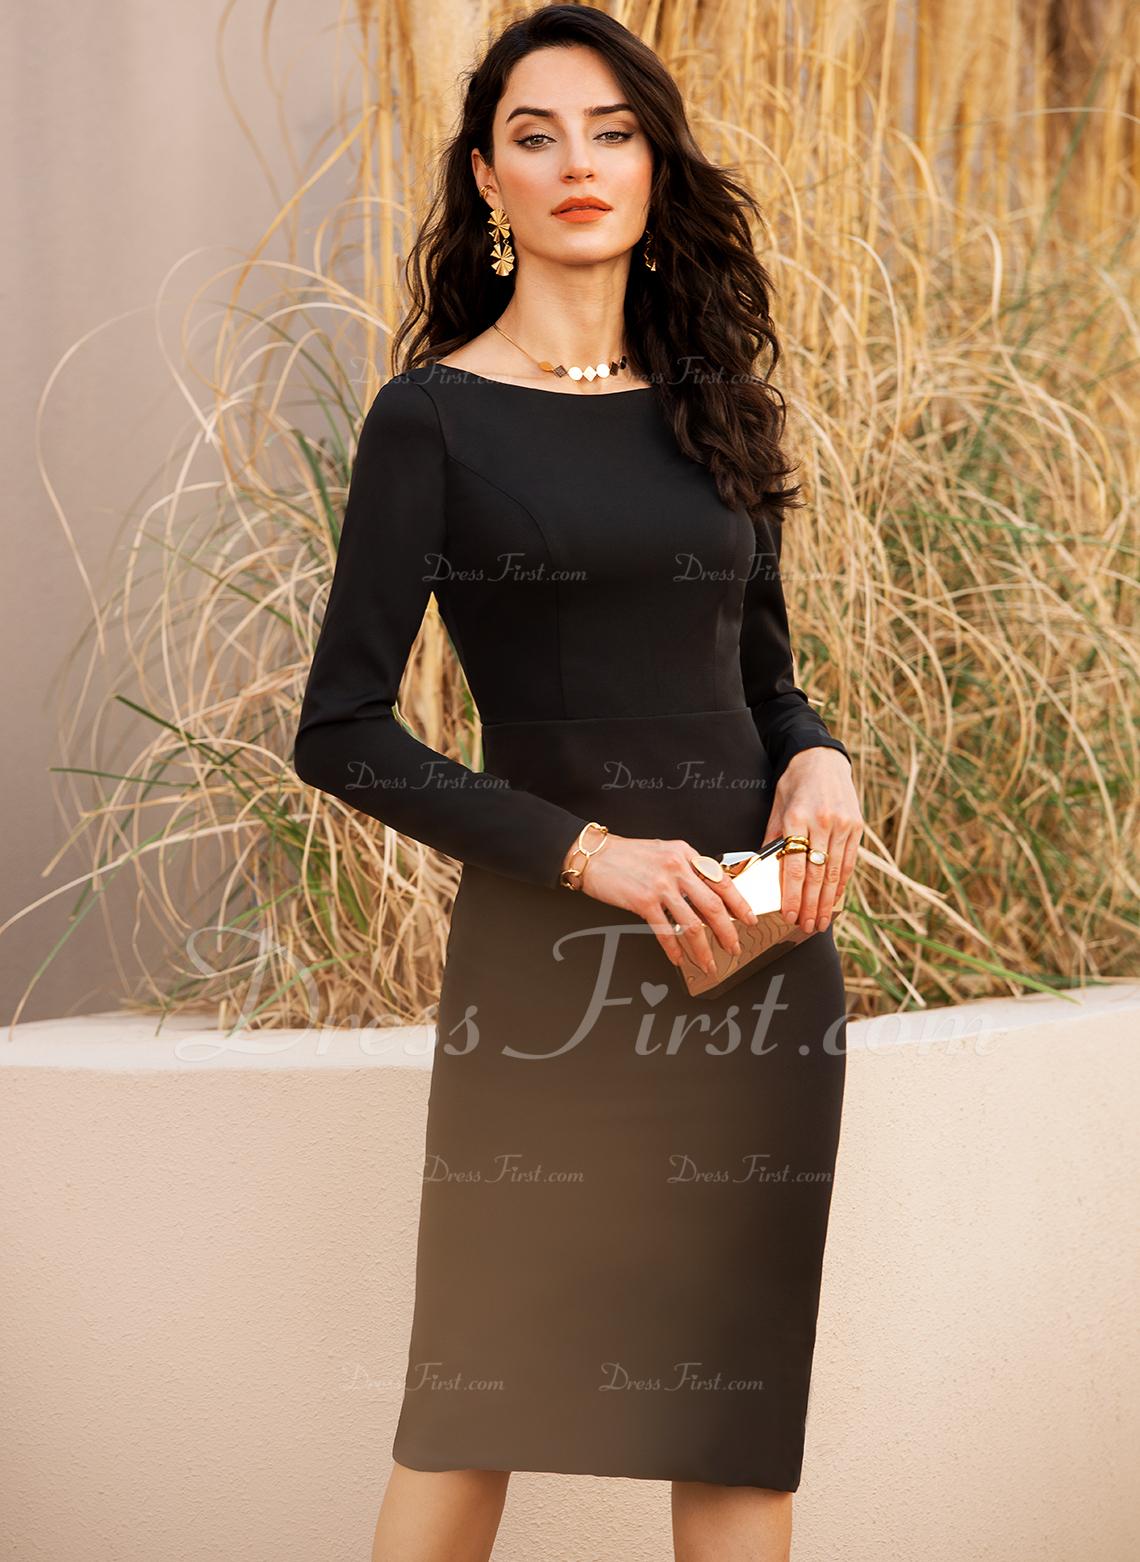 Conică Mâneci Lungi Midi Sırt Ayrıntıları Negre Parti Modern Sexy Moda Elbiseler